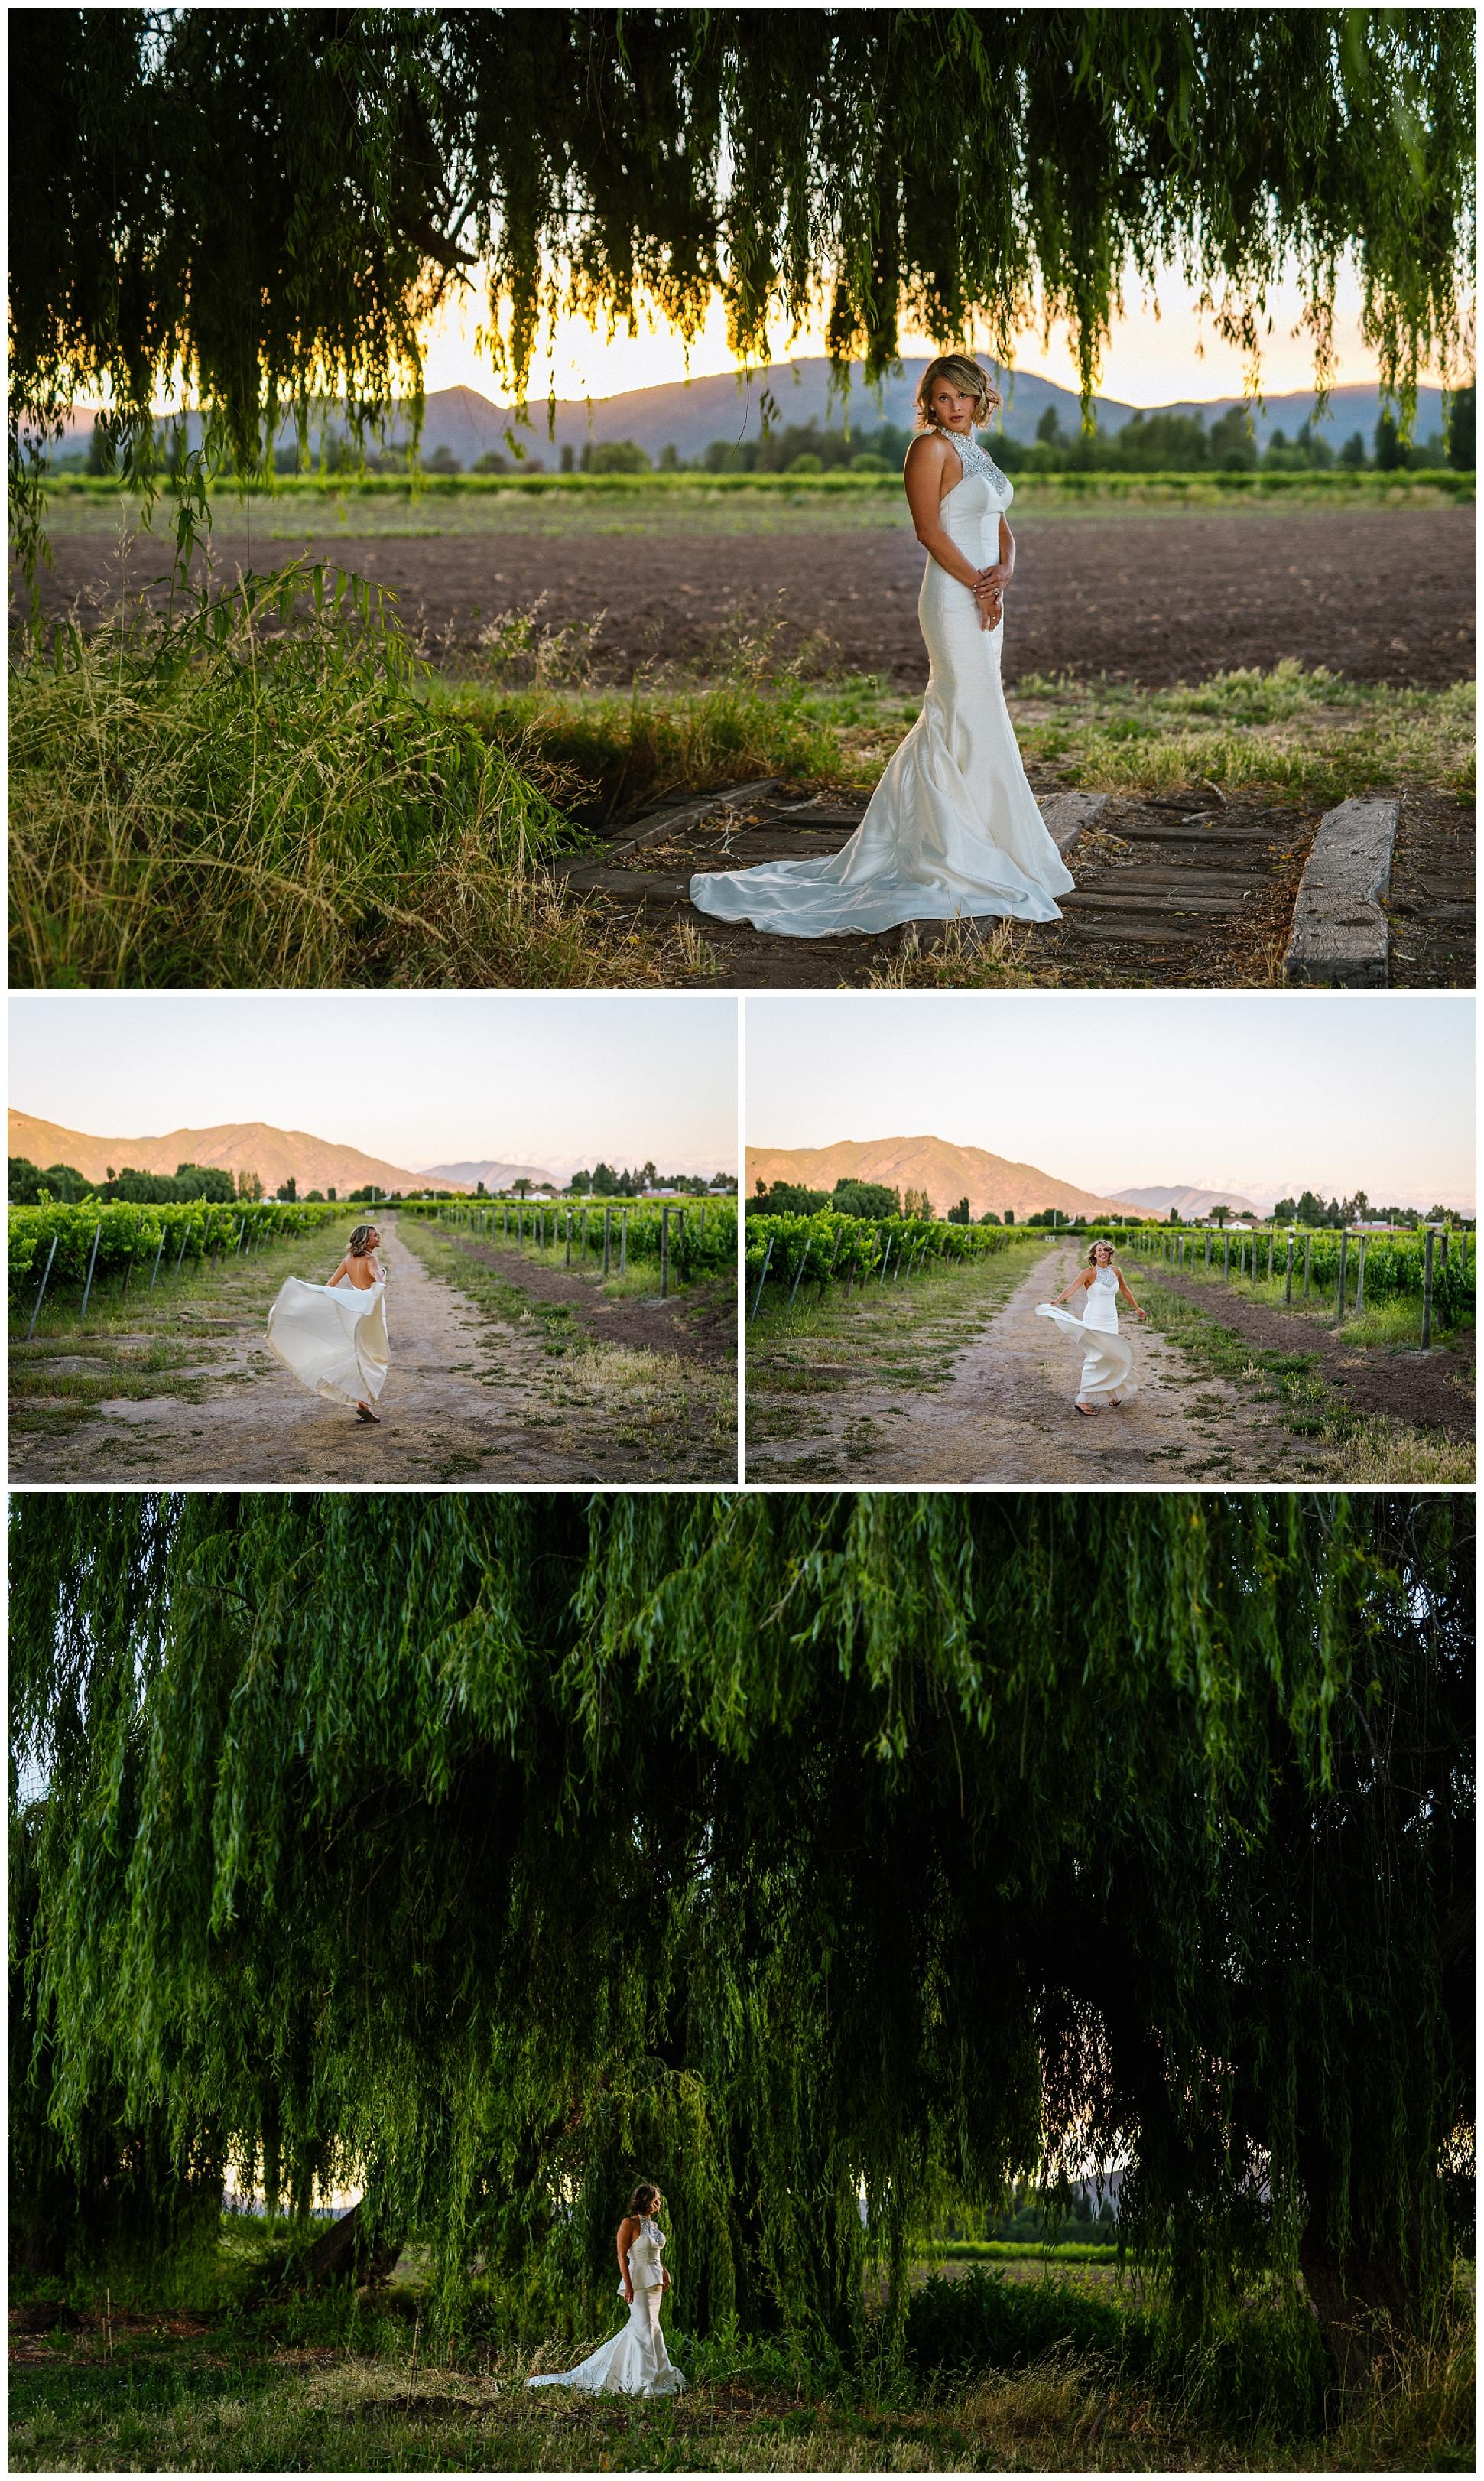 Cheilean-destination-adventure-wedding-florida-patagonia-pucon-santa-cruz-vsco_0146.jpg